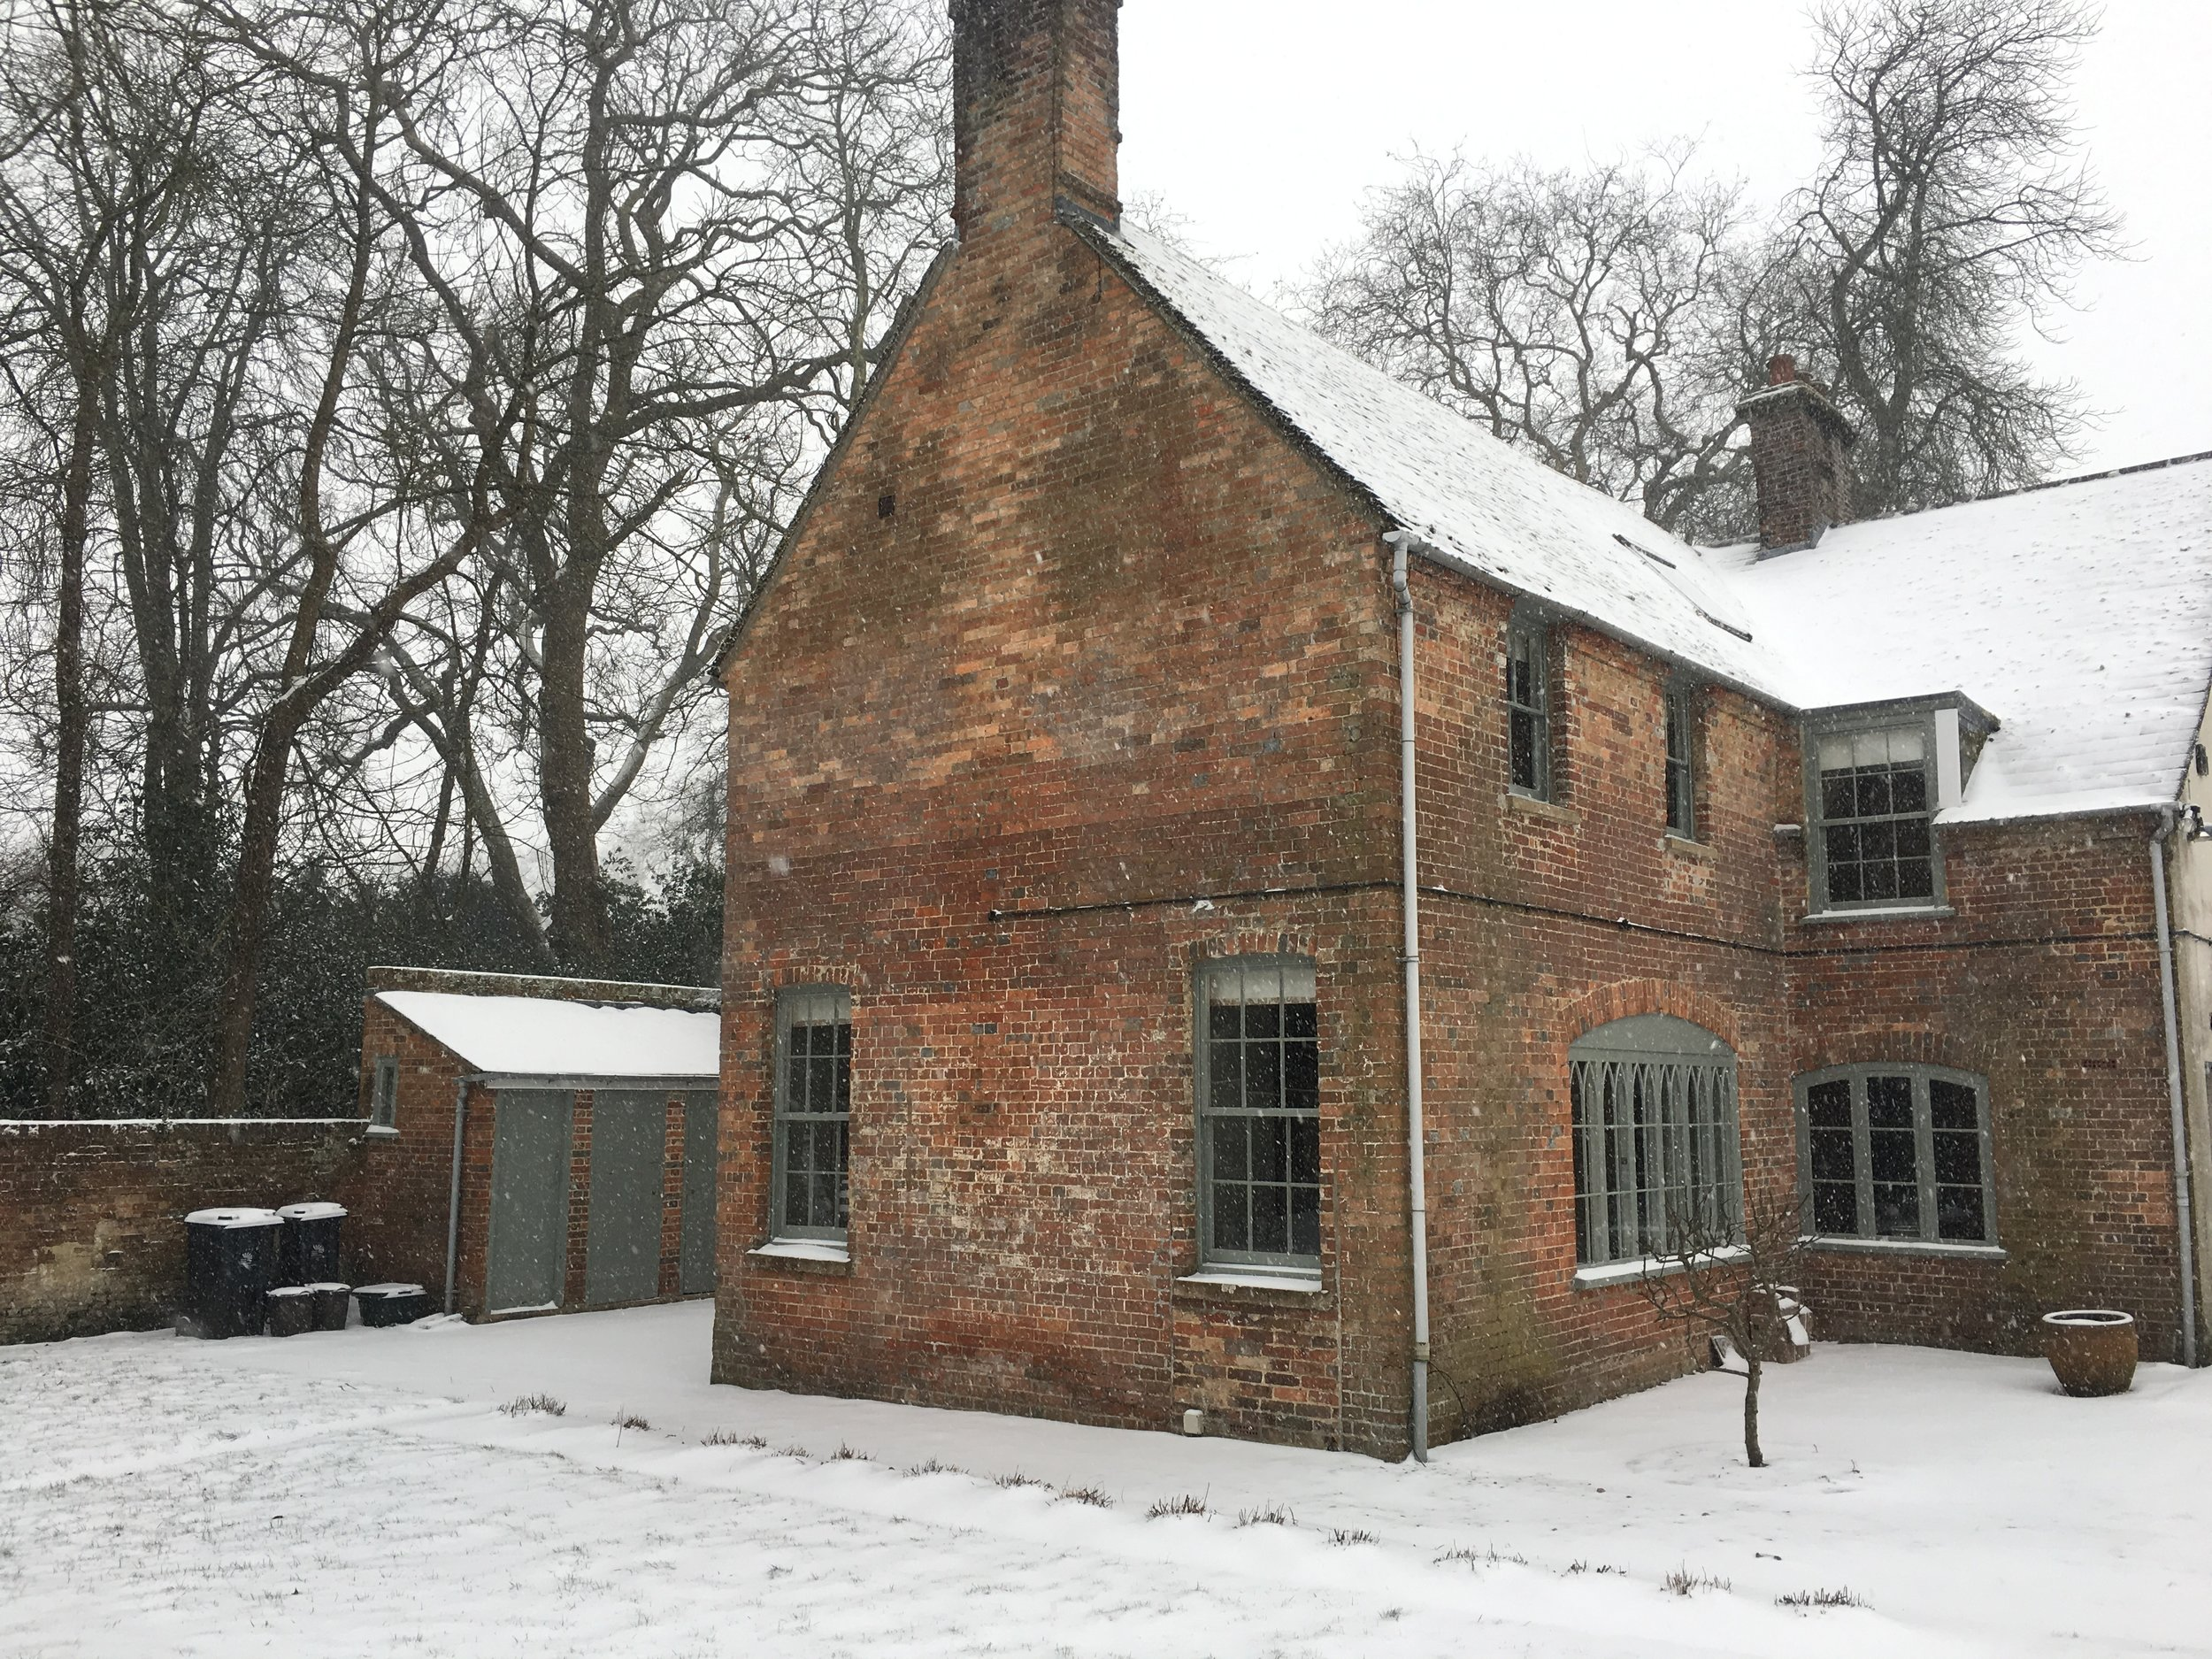 Gate House Snow